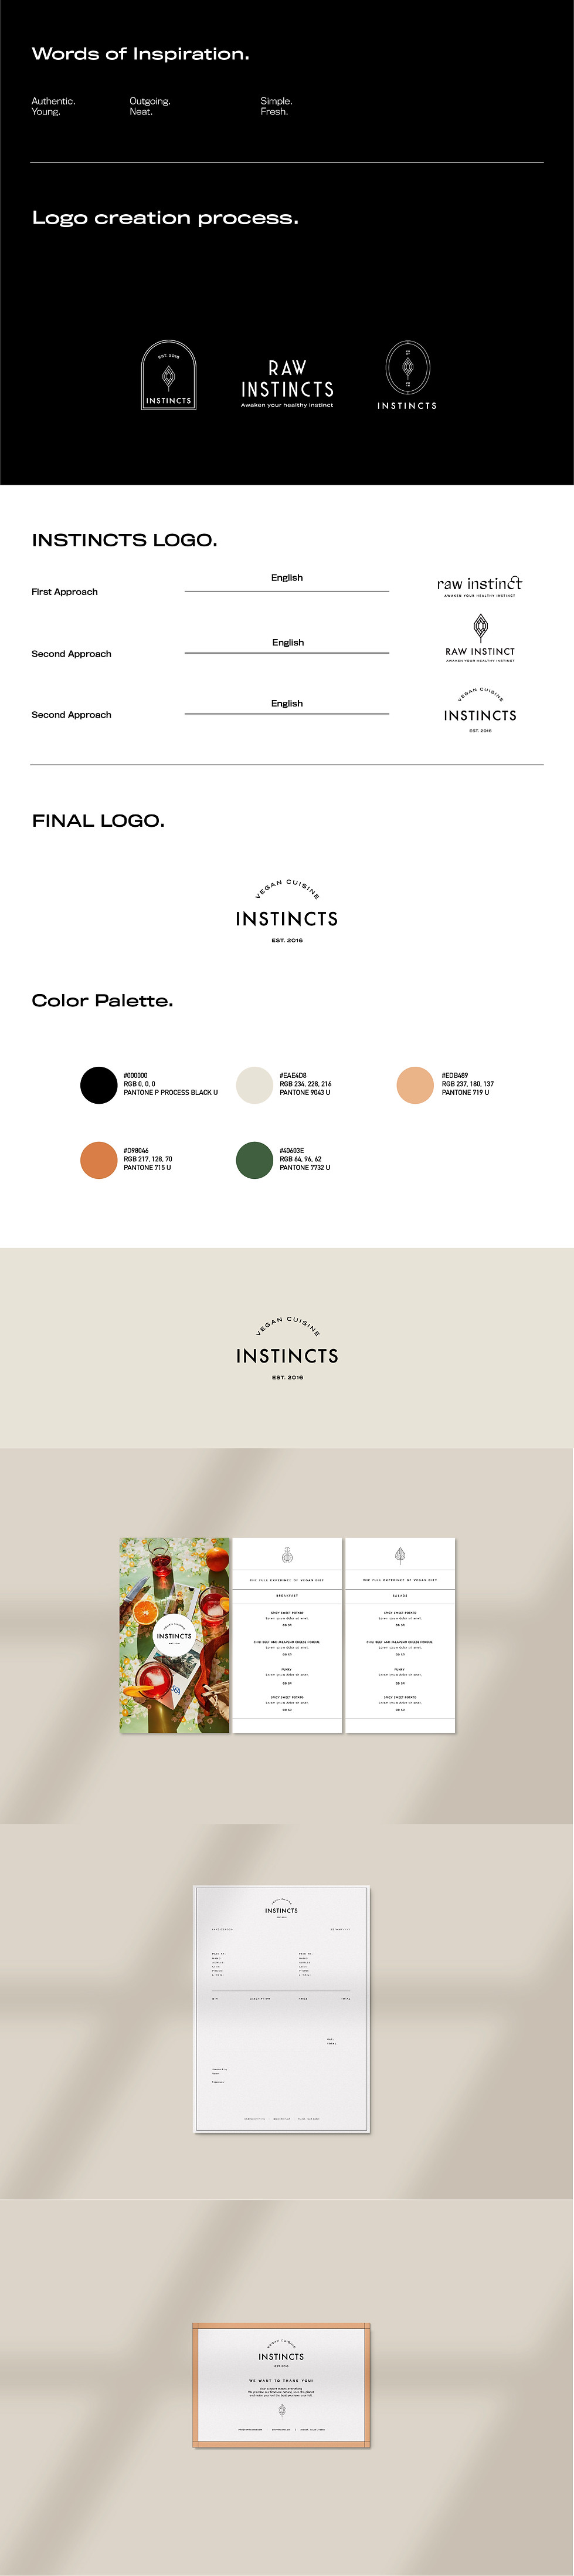 INSTINCTS | PROCESS-03.jpg